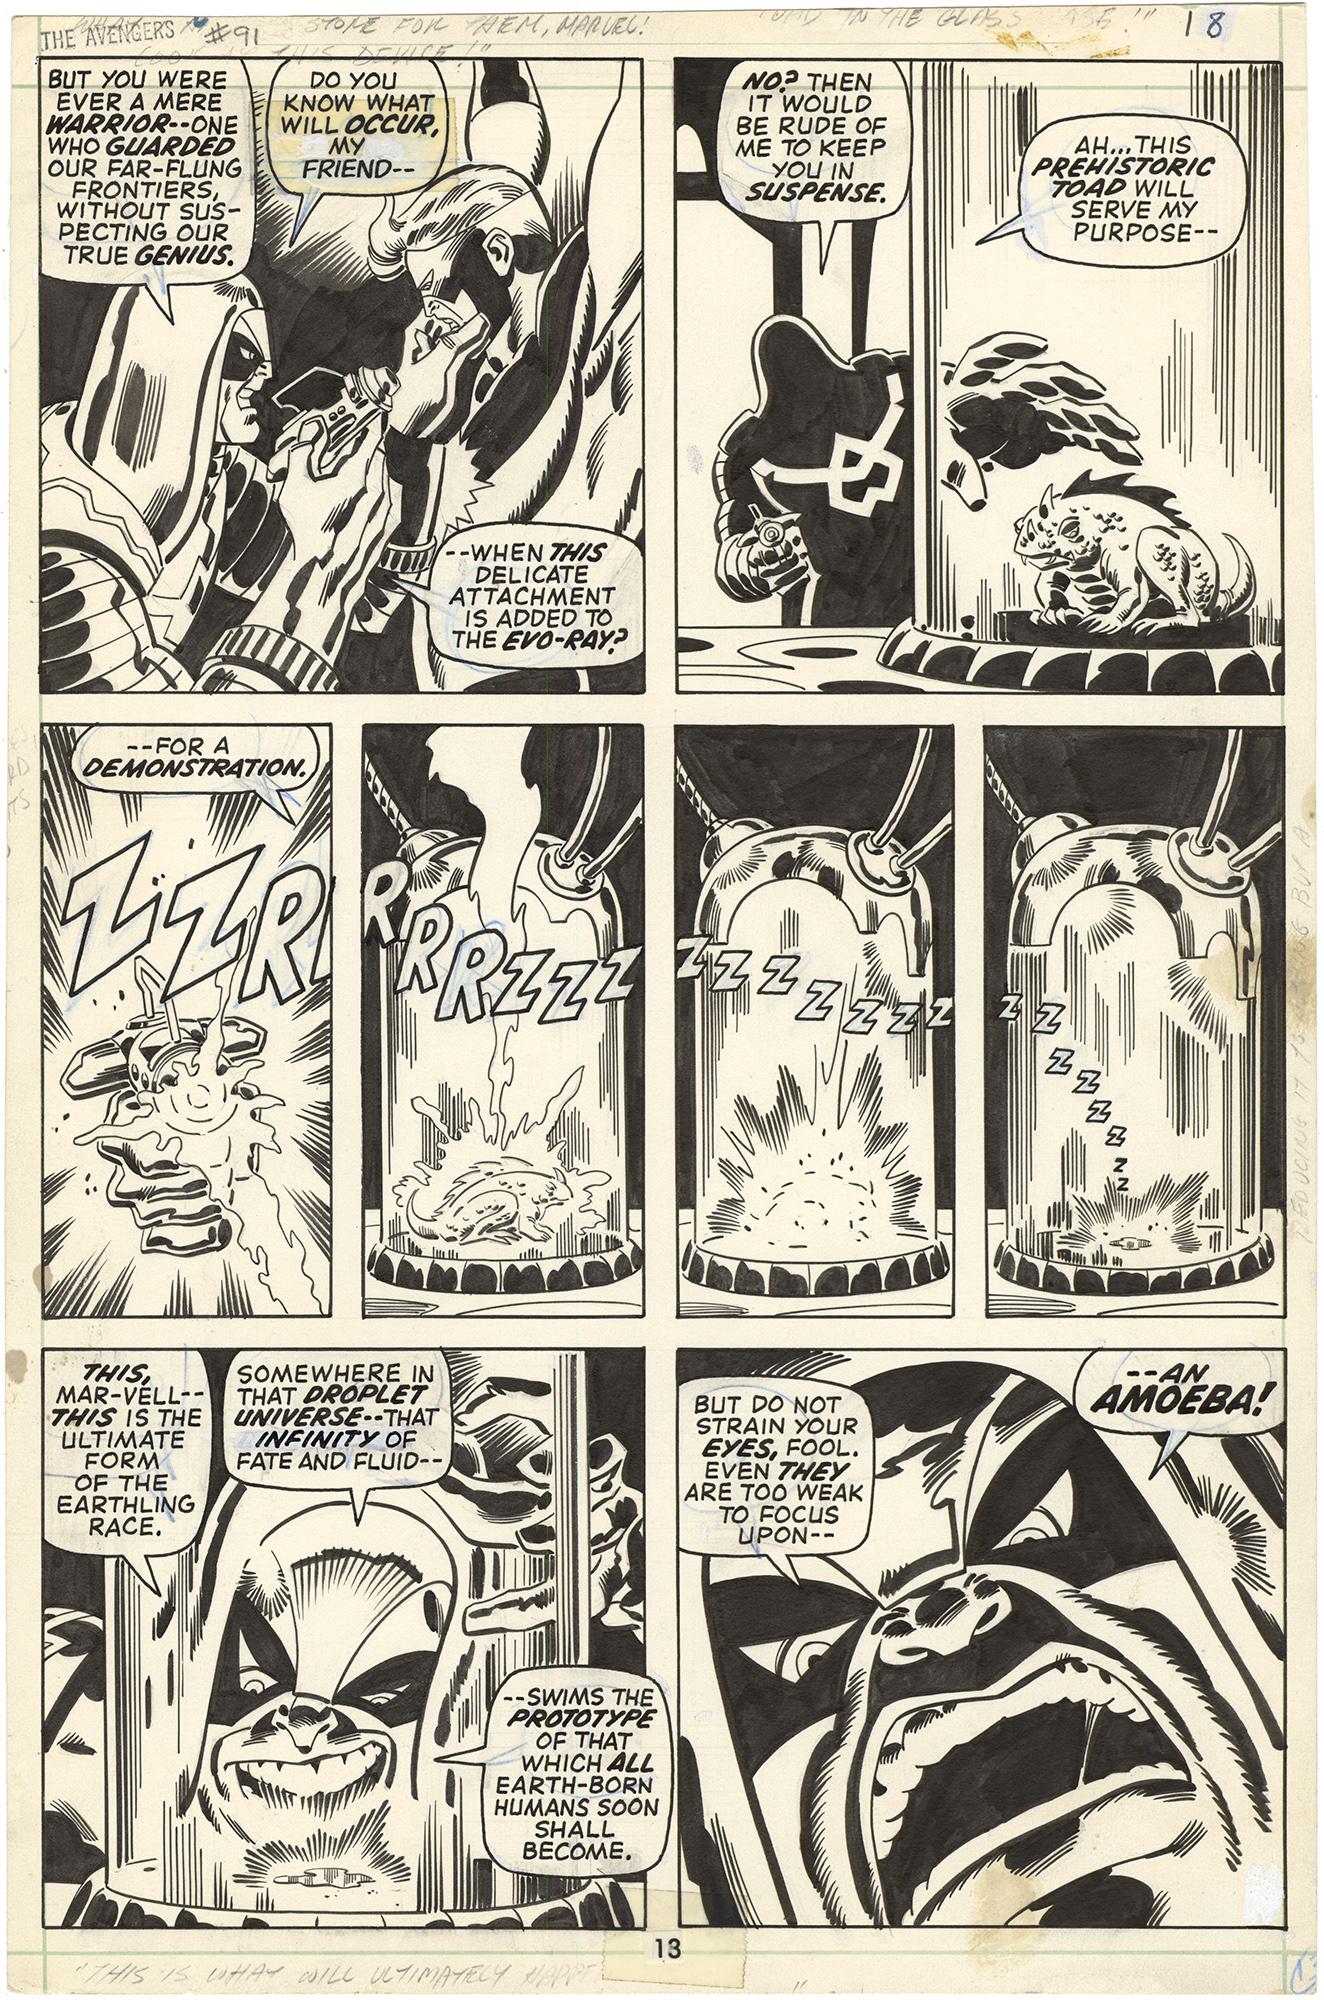 Avengers #91 p13